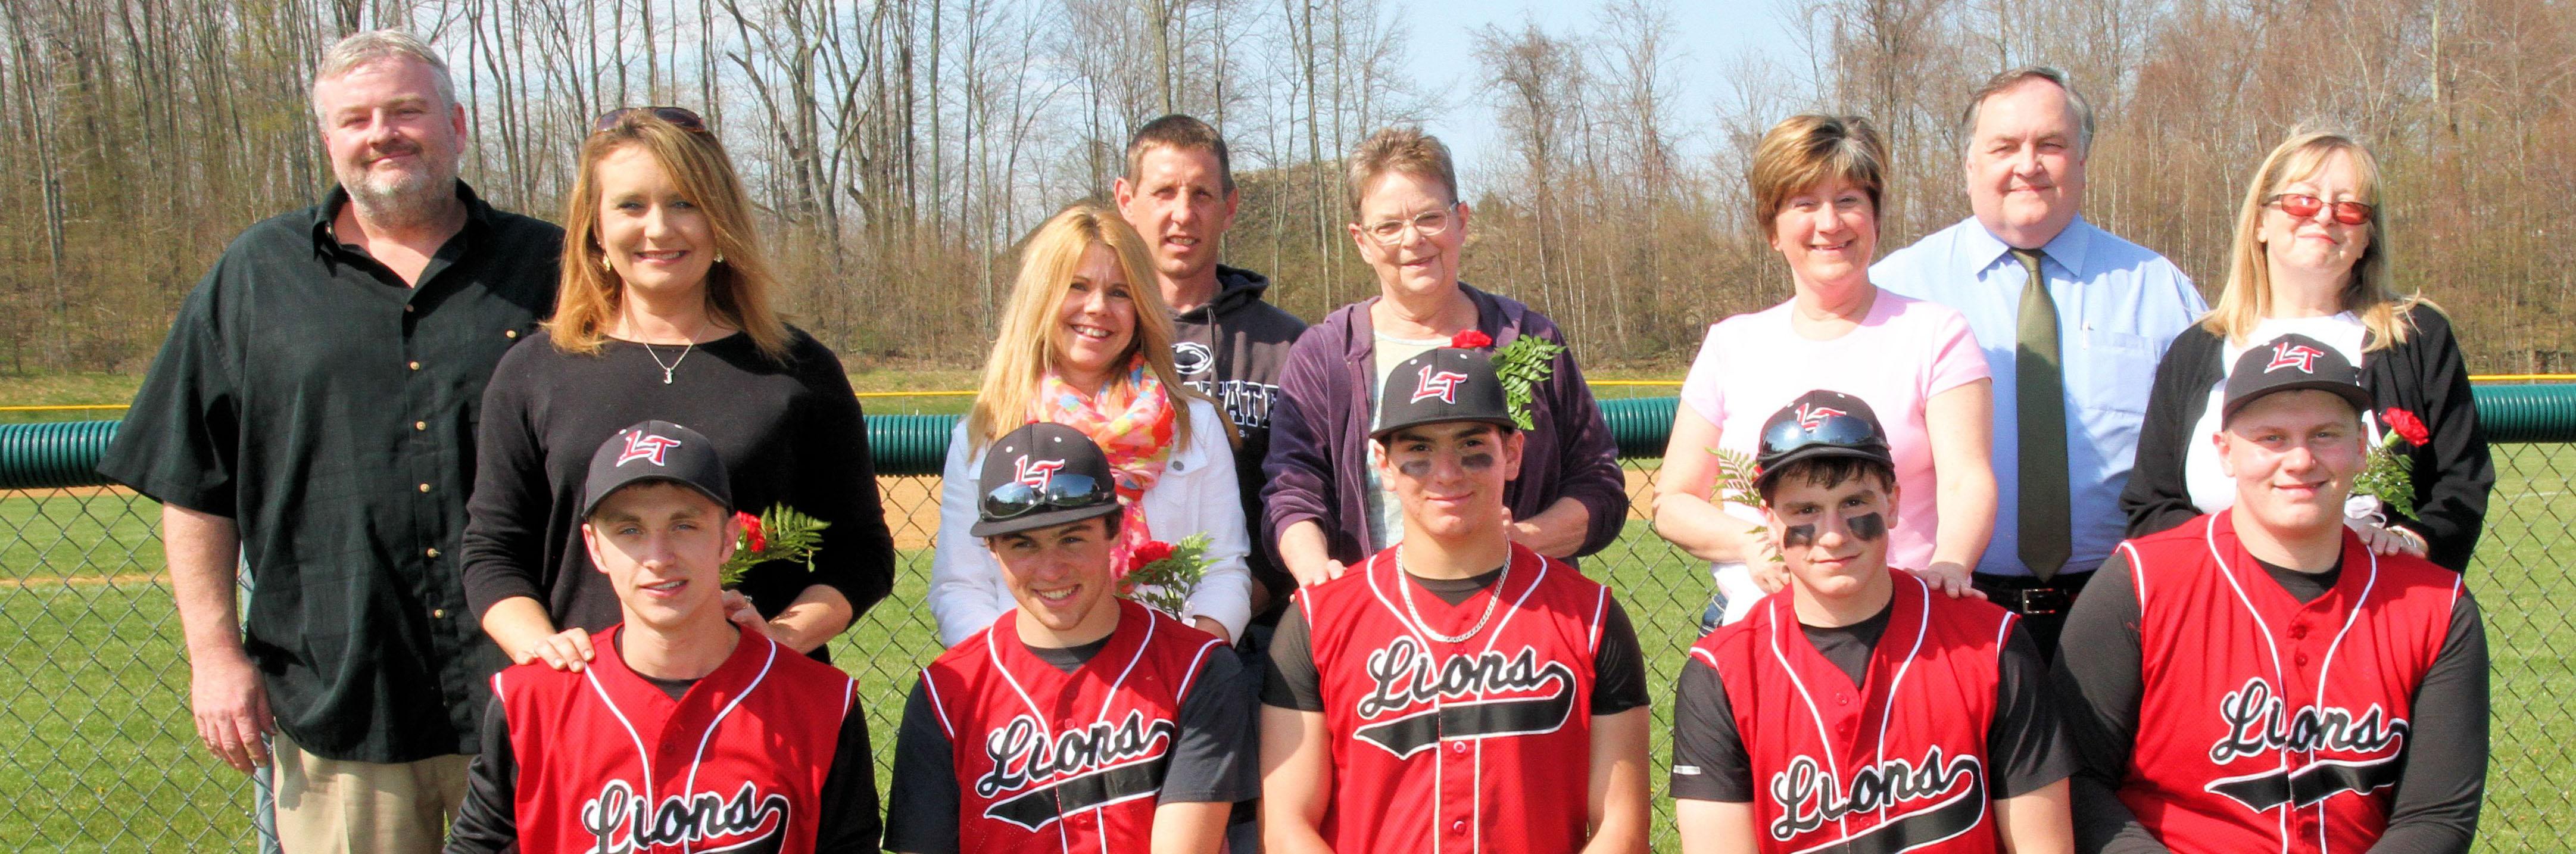 LT Baseball Parents